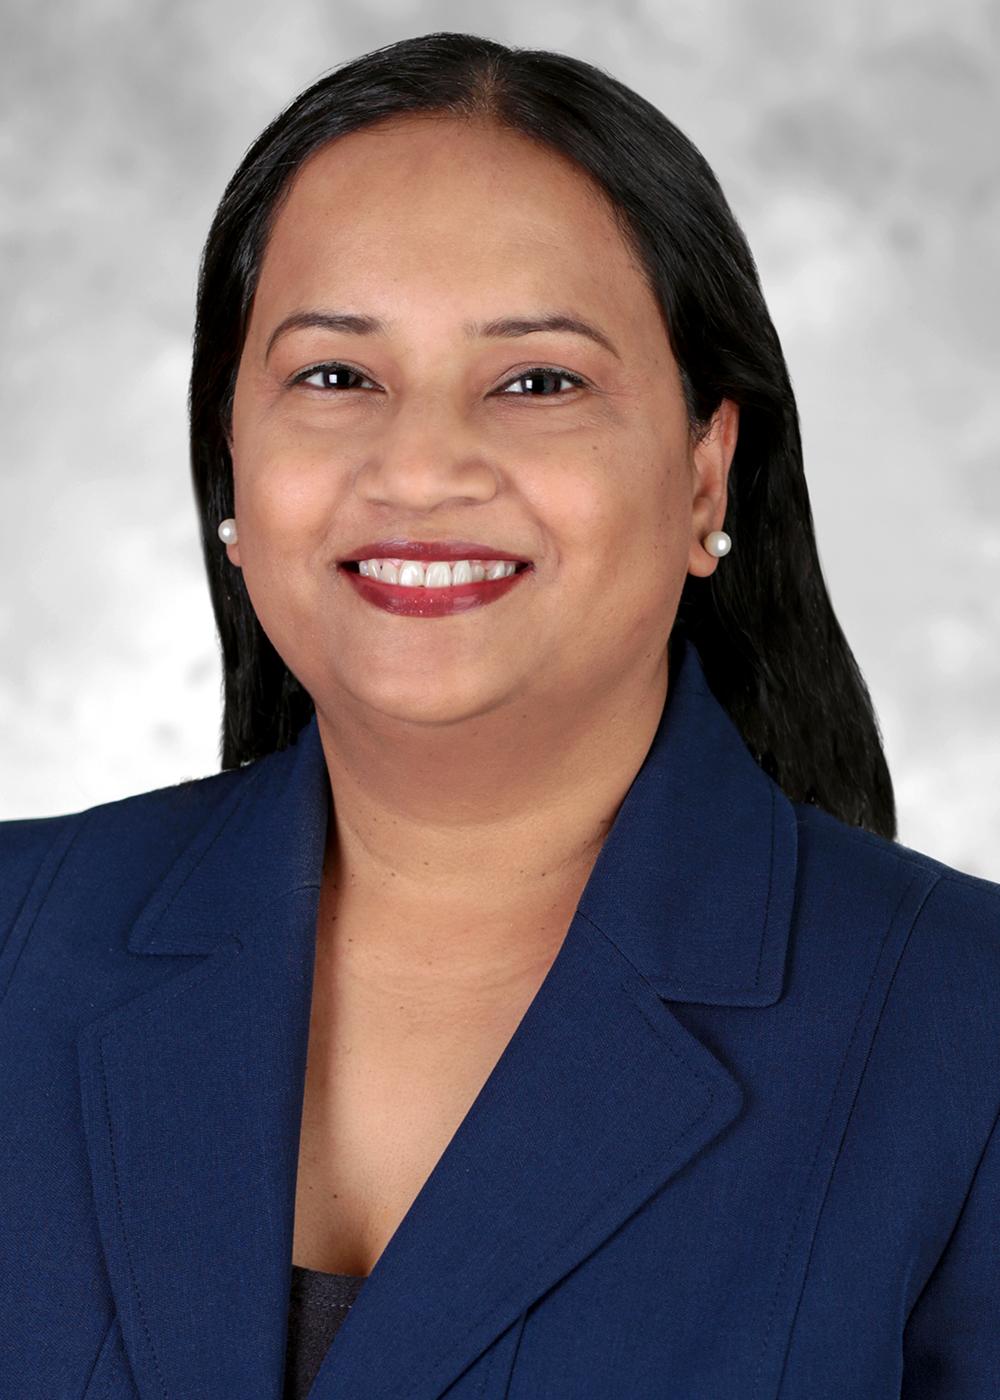 Dr. Subhashini Ayloo